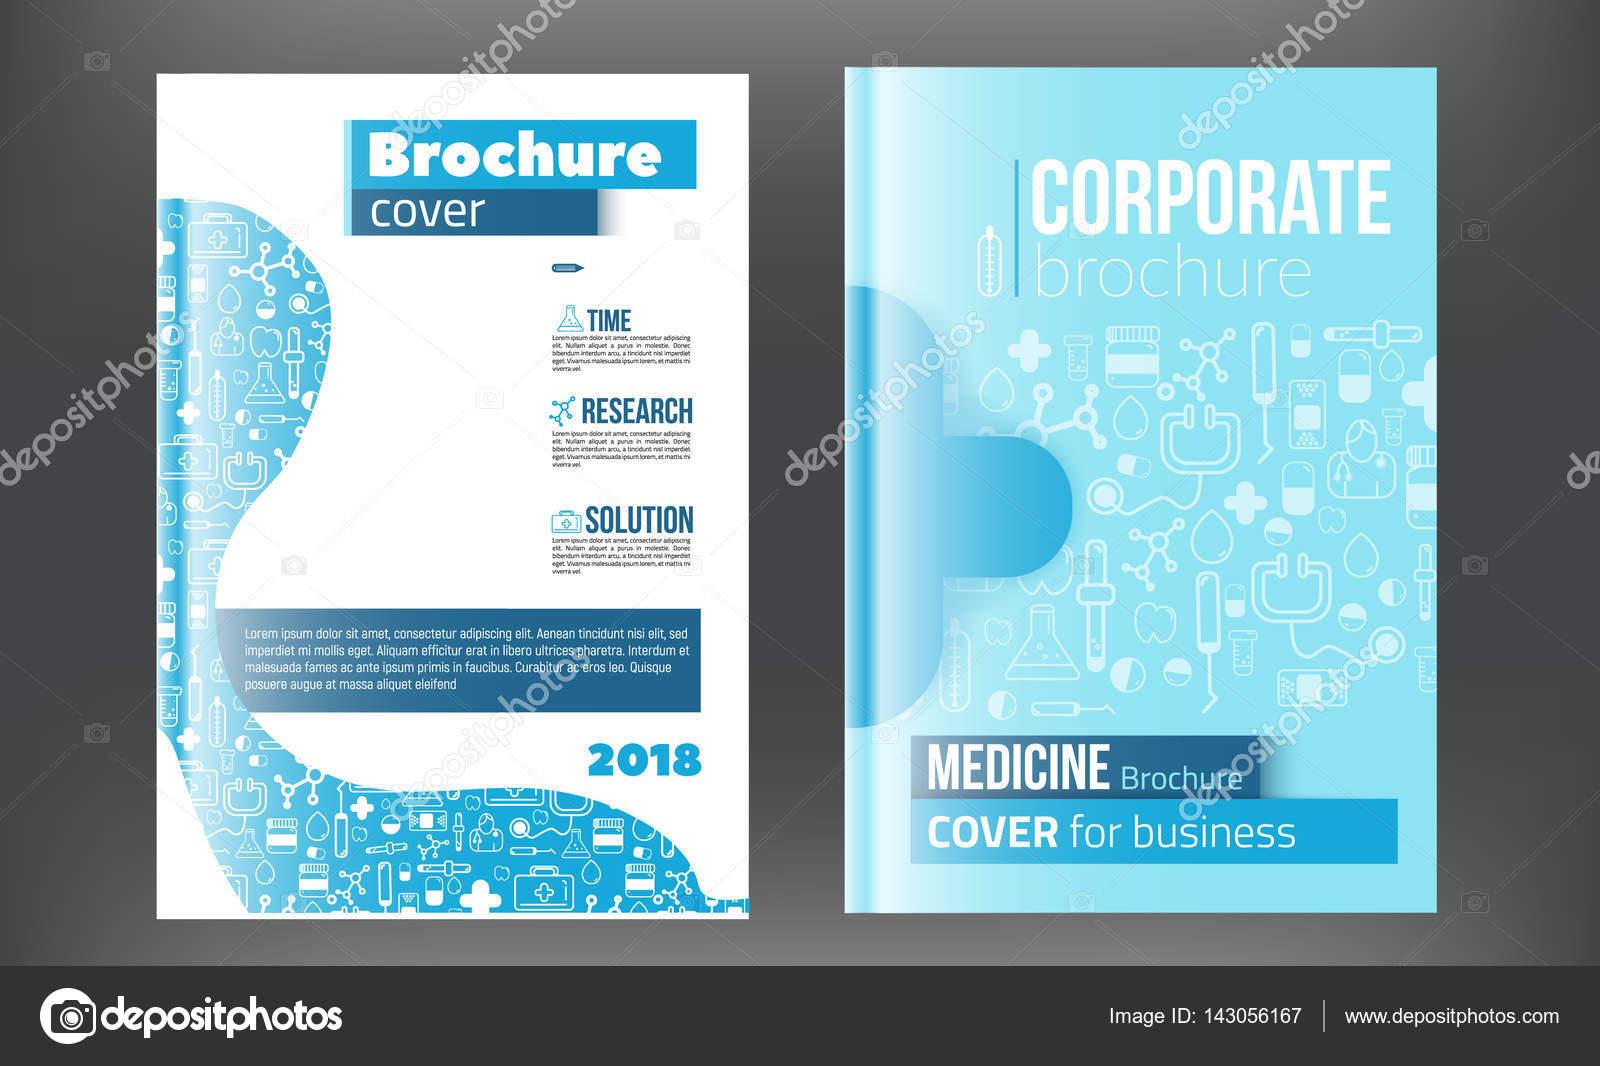 Medical Brochure Design Template Flyer with inline medicine icons - medical brochure